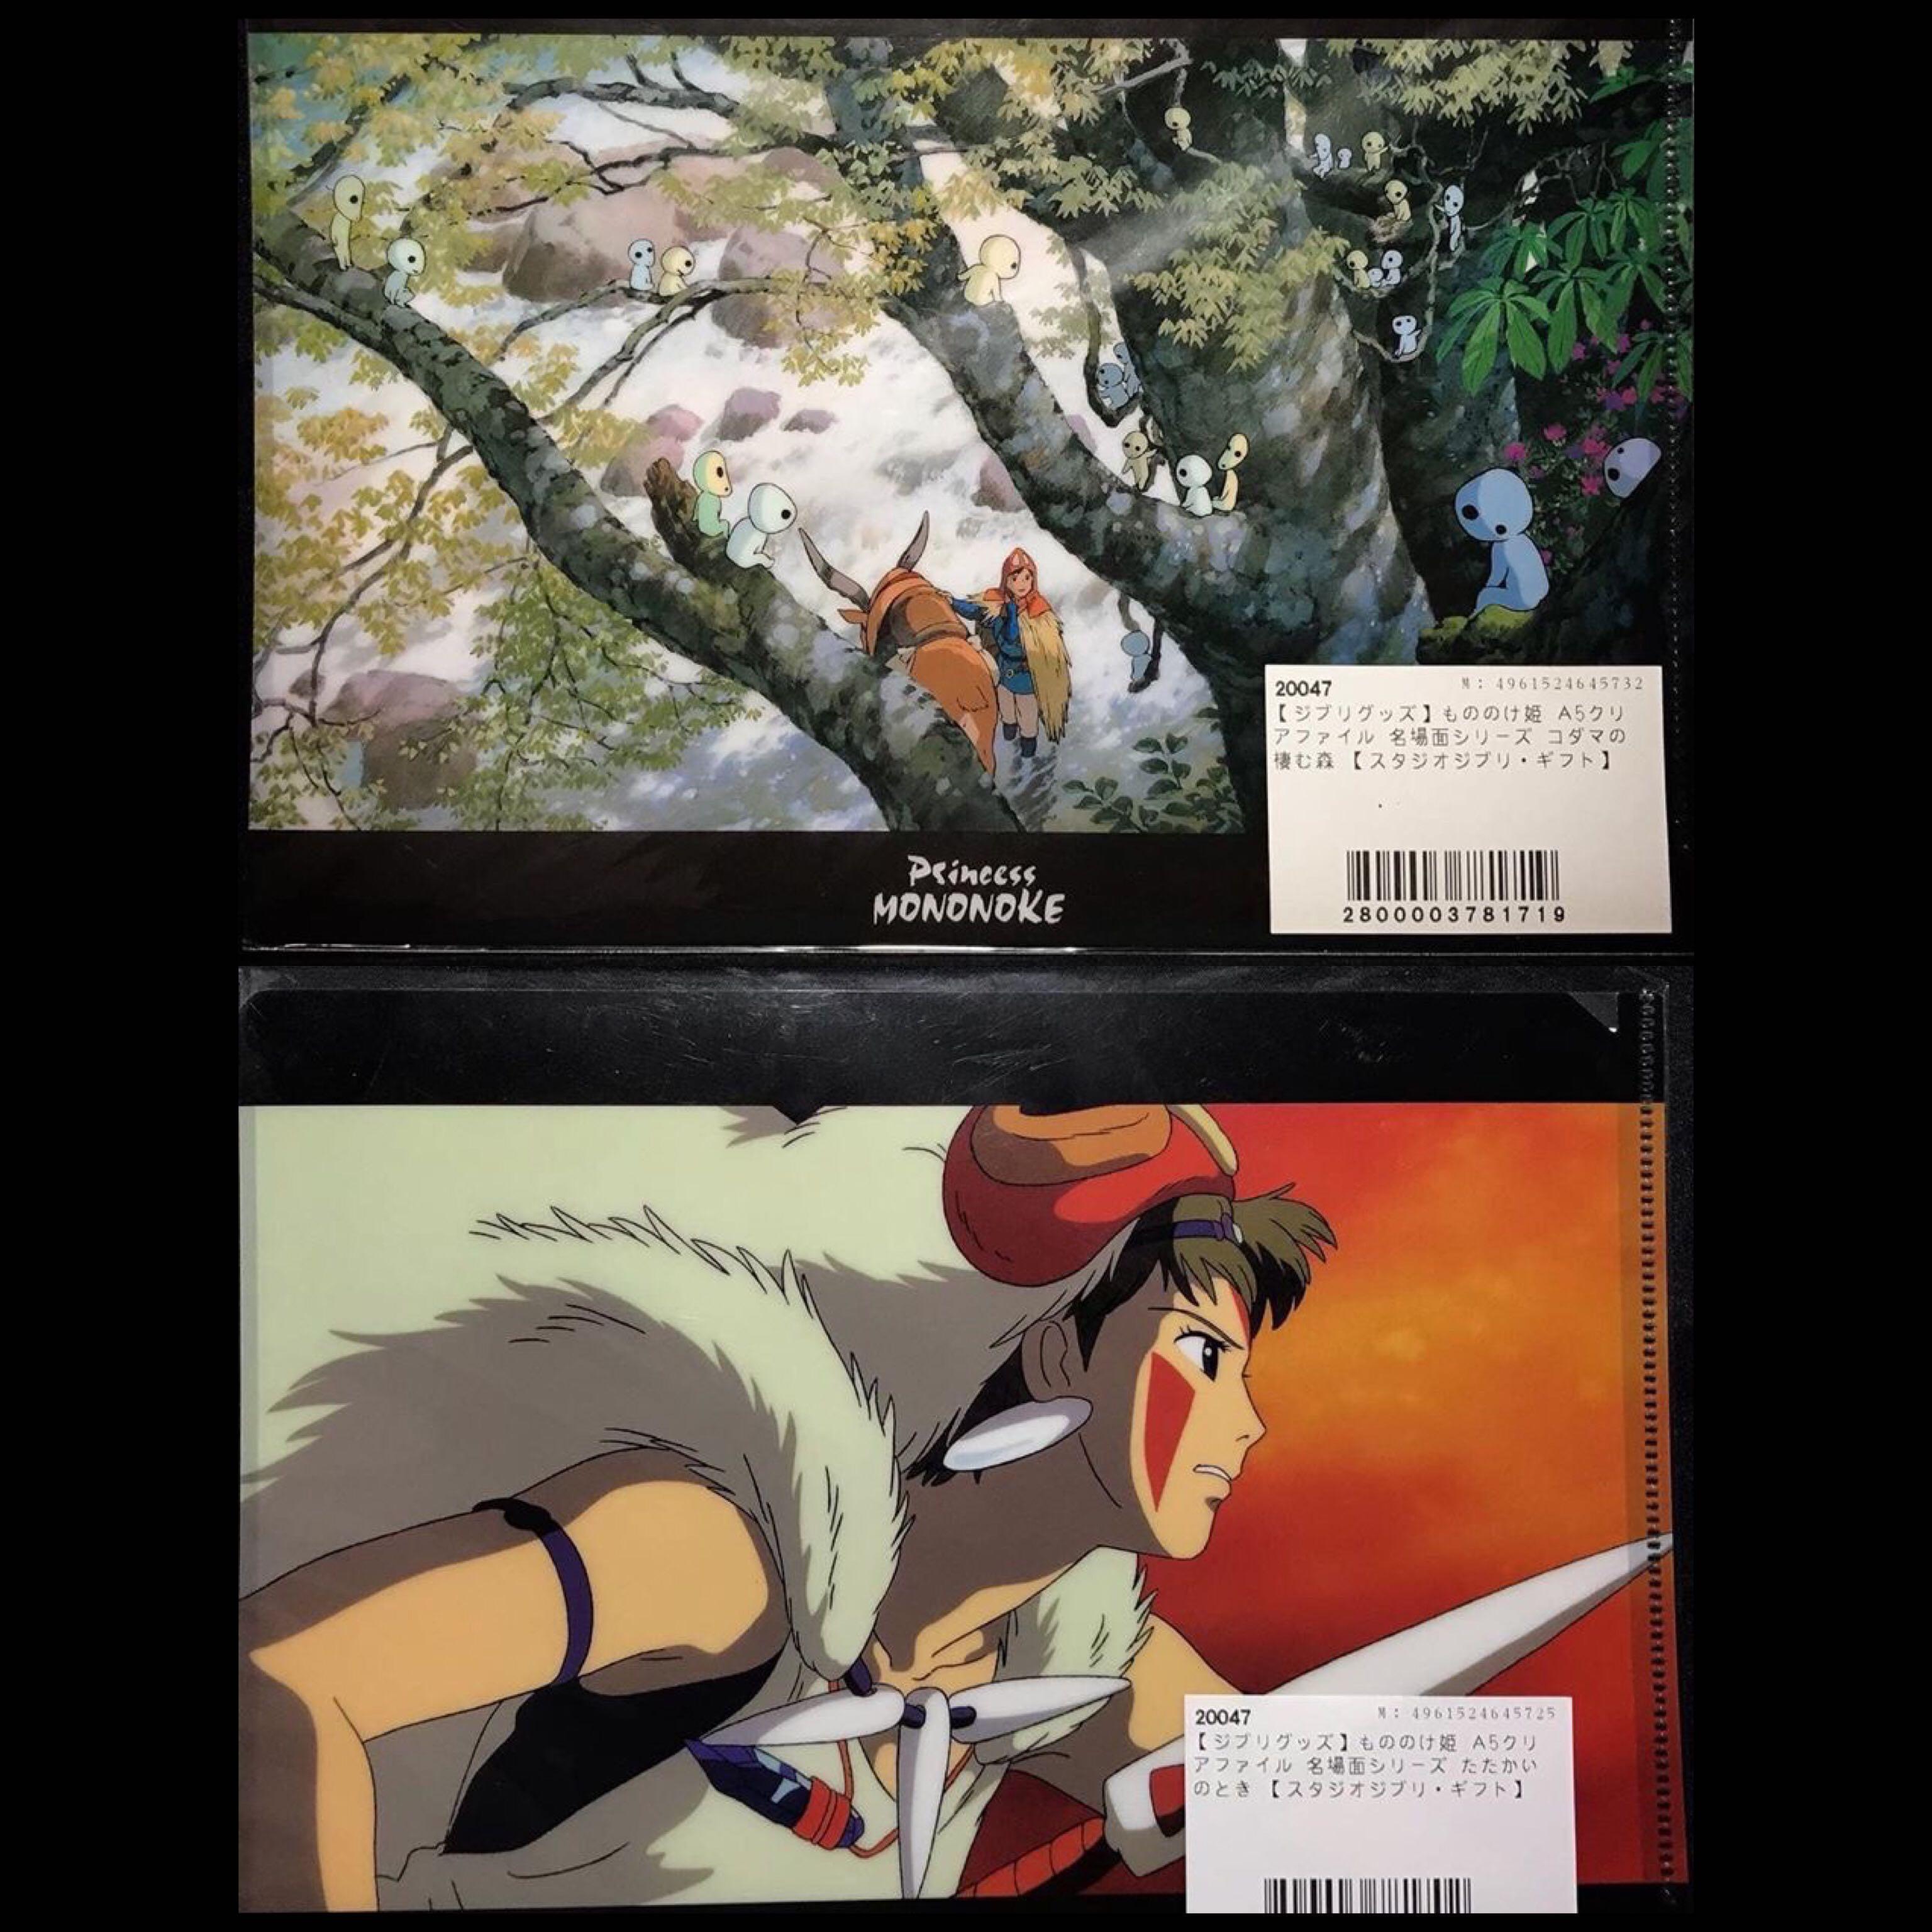 Official Studio Ghibli Princess Mononoke A5 Clear File Folder - Php 150 each